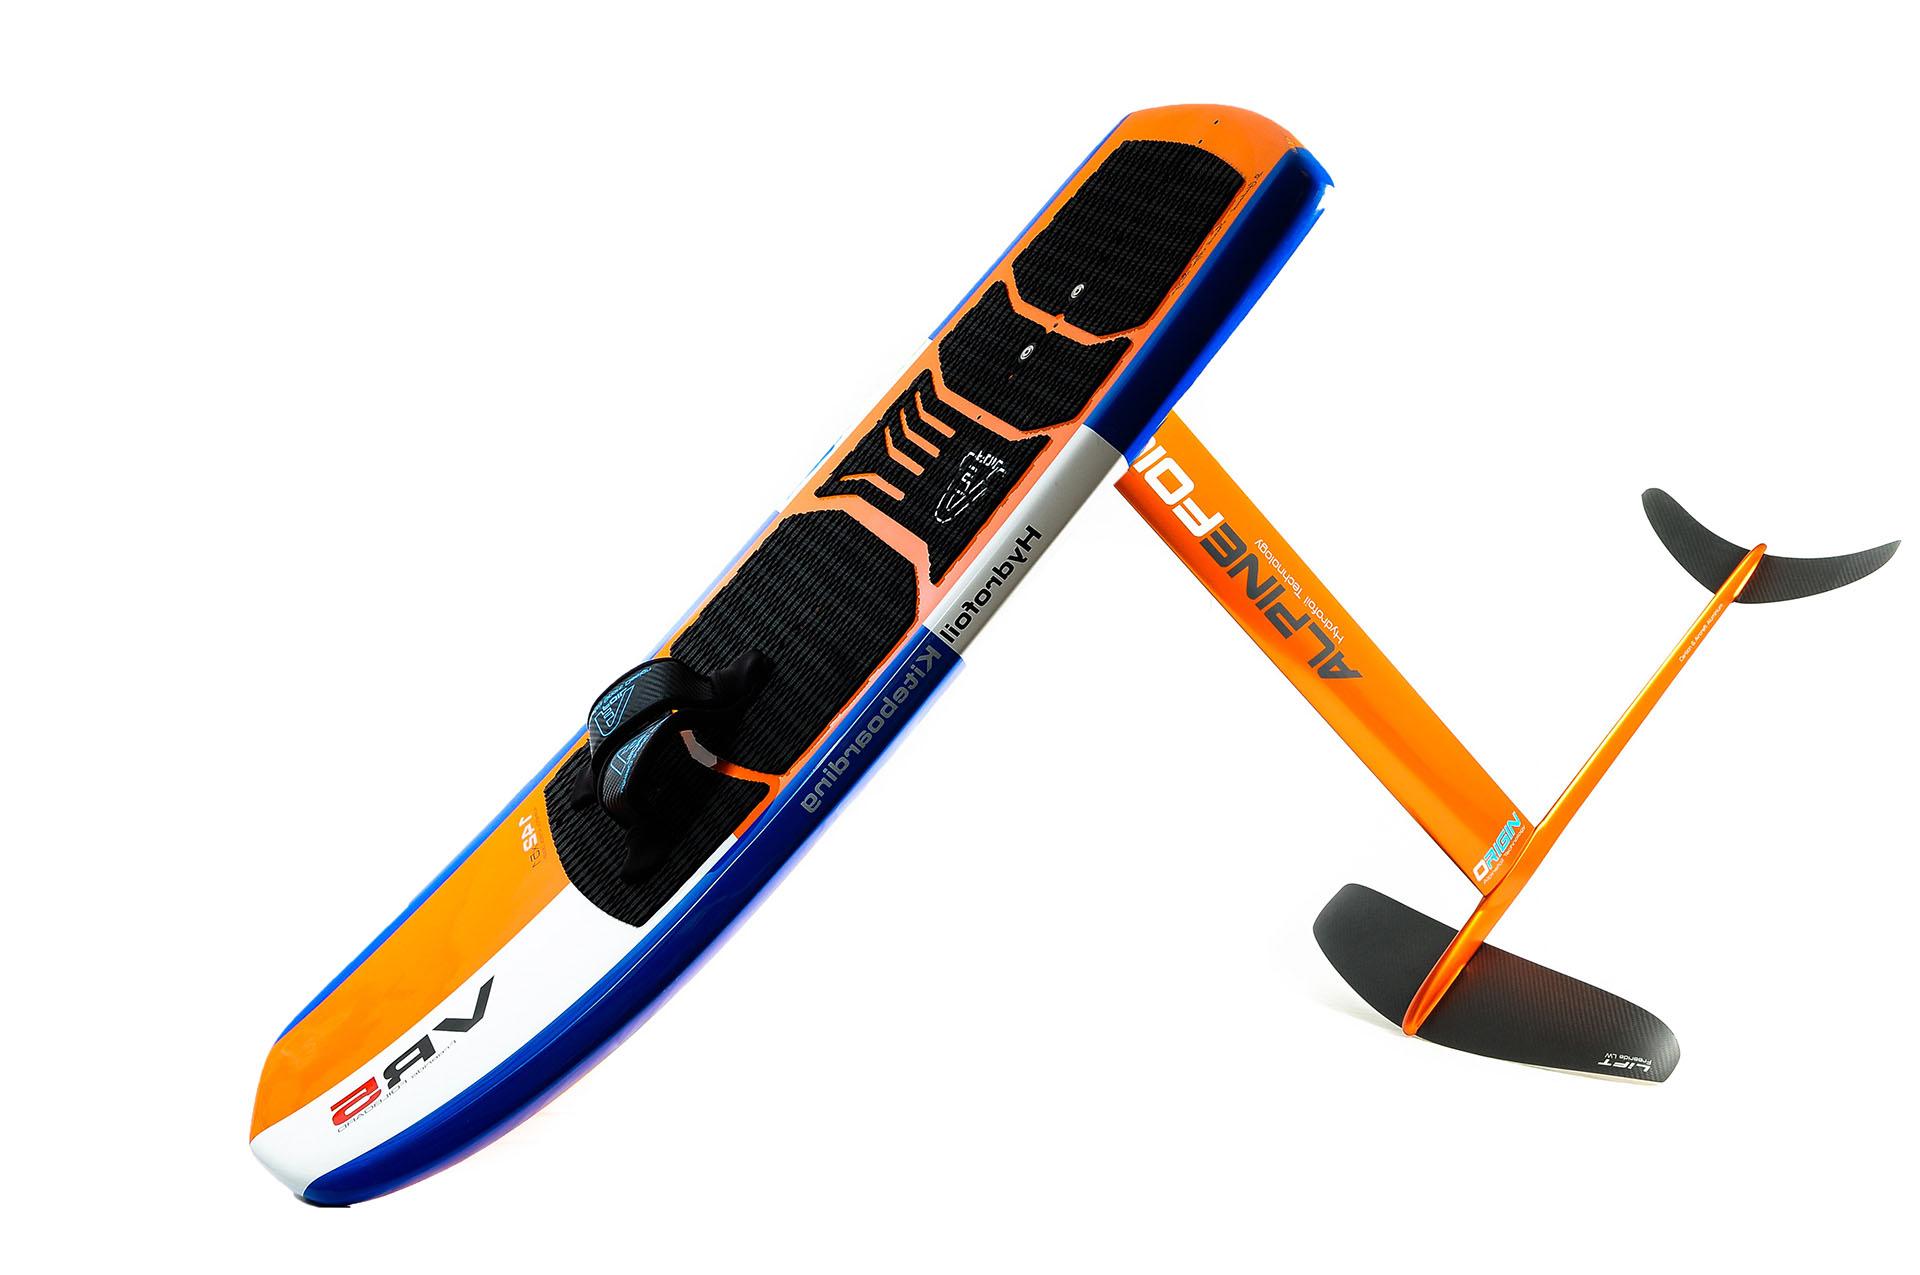 Kitefoil alpinefoil origin vr5